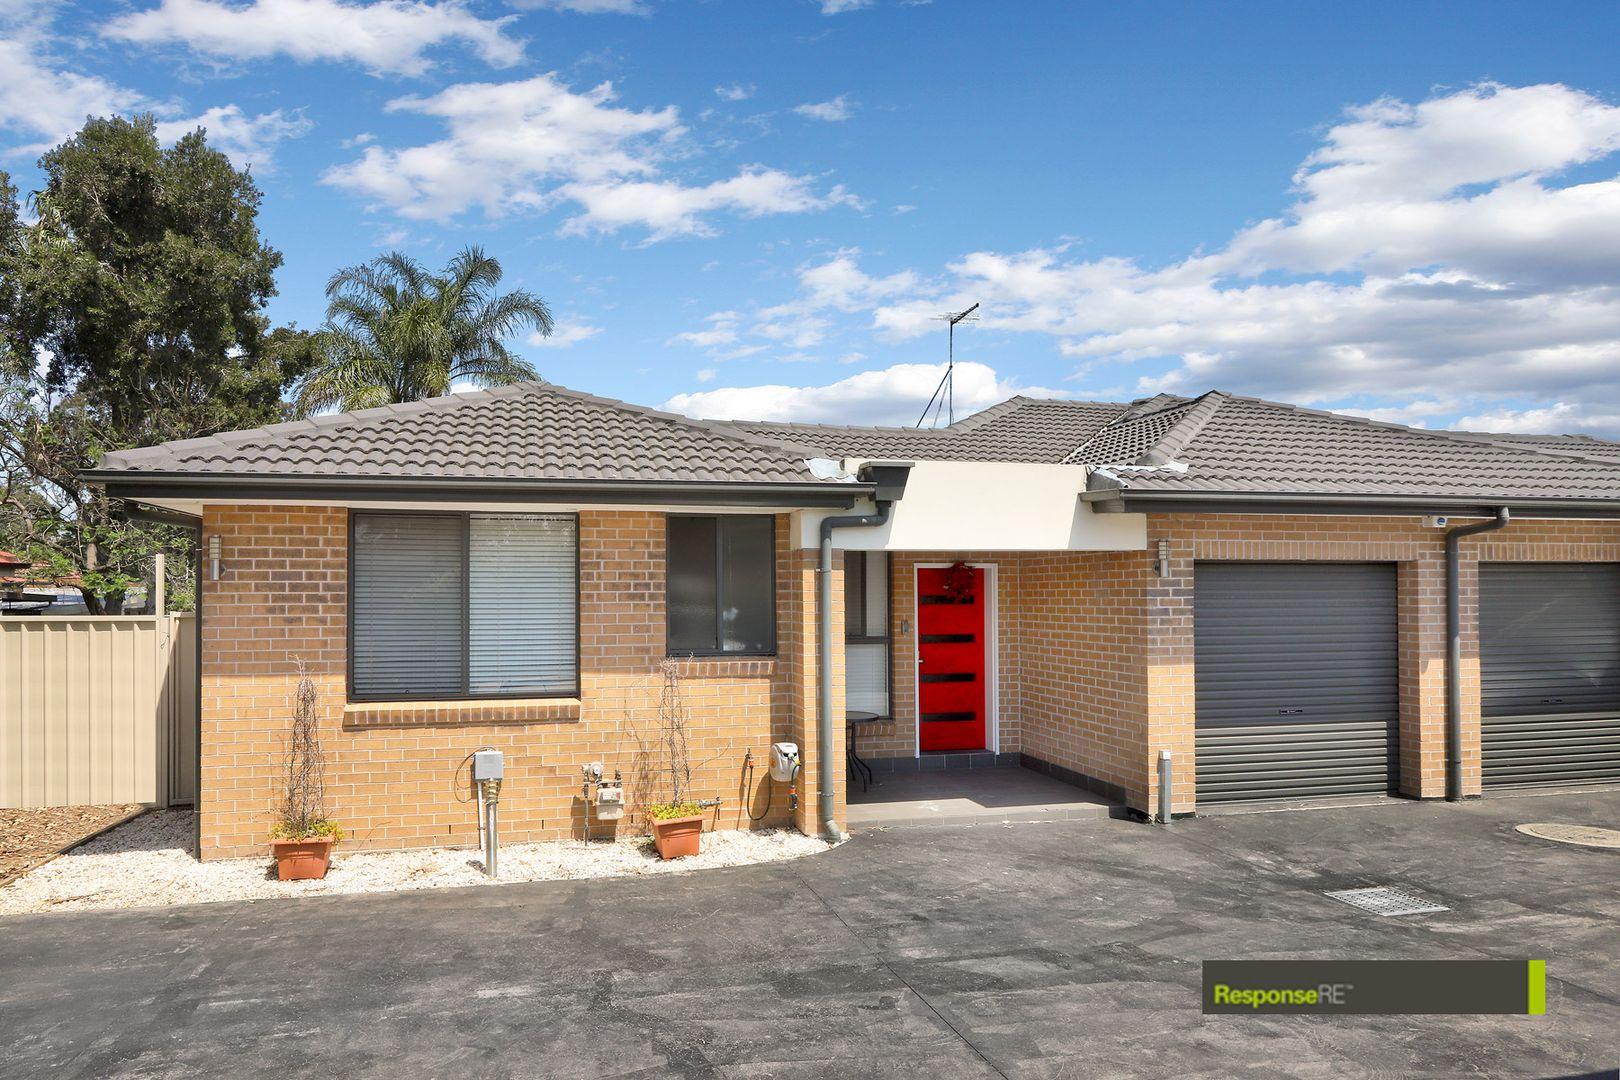 5/144 Kildare Road, Blacktown NSW 2148, Image 0